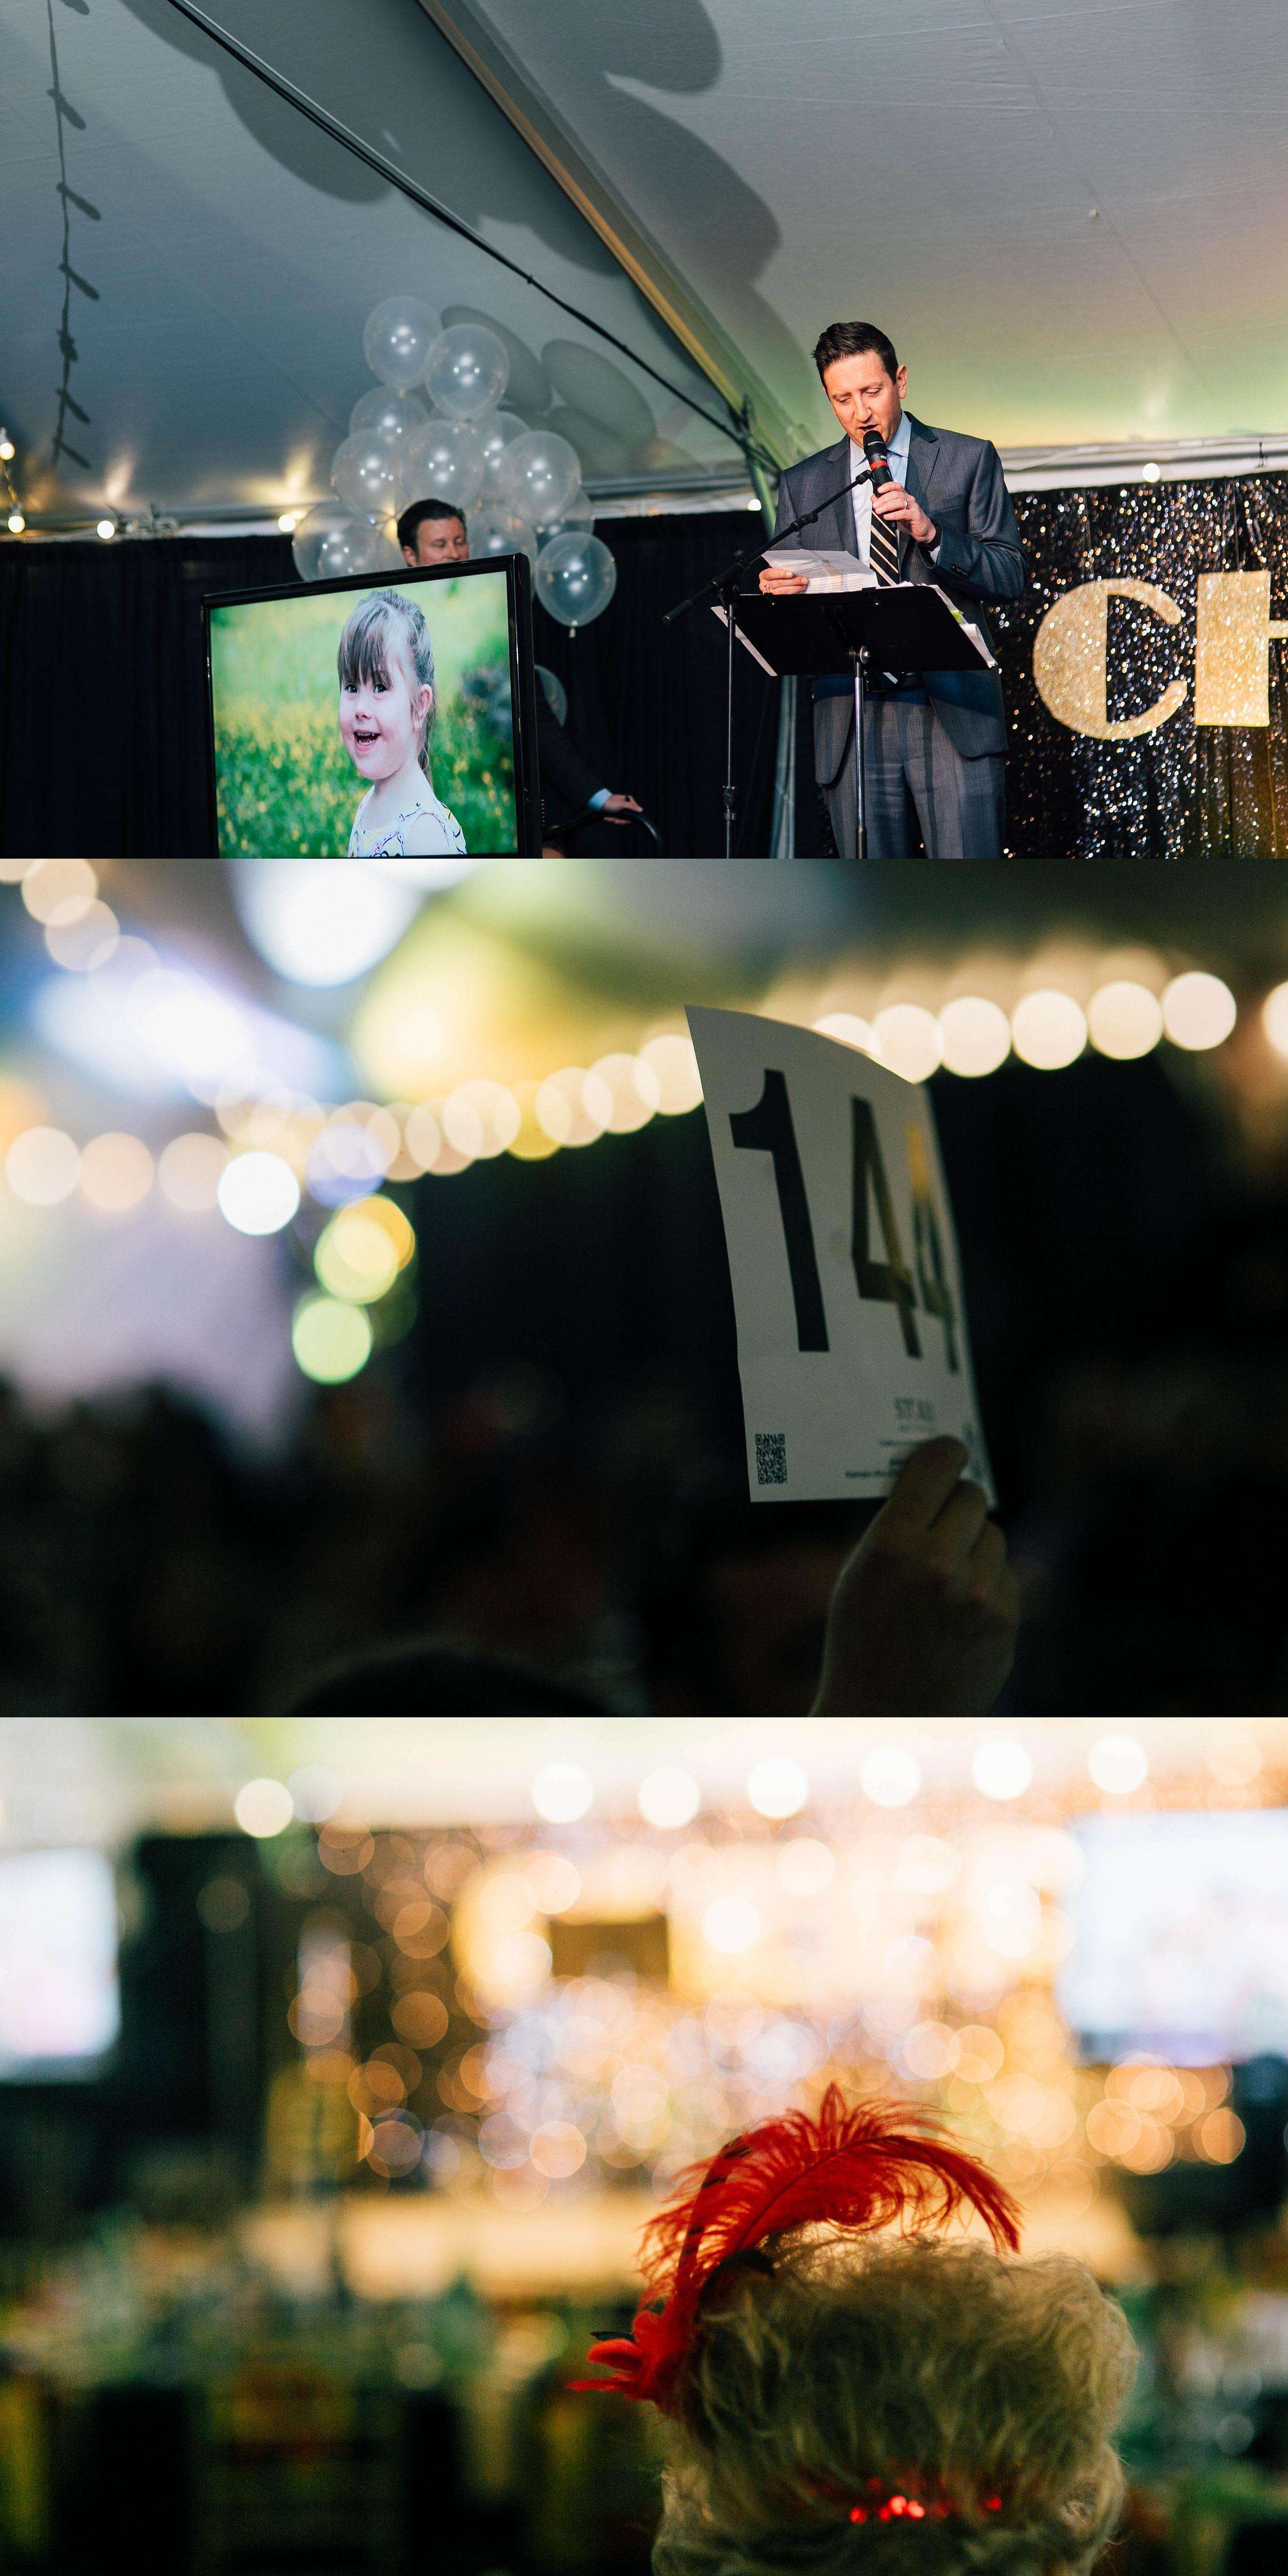 ashley_vos_seattle_wedding_photographer_0032.jpg